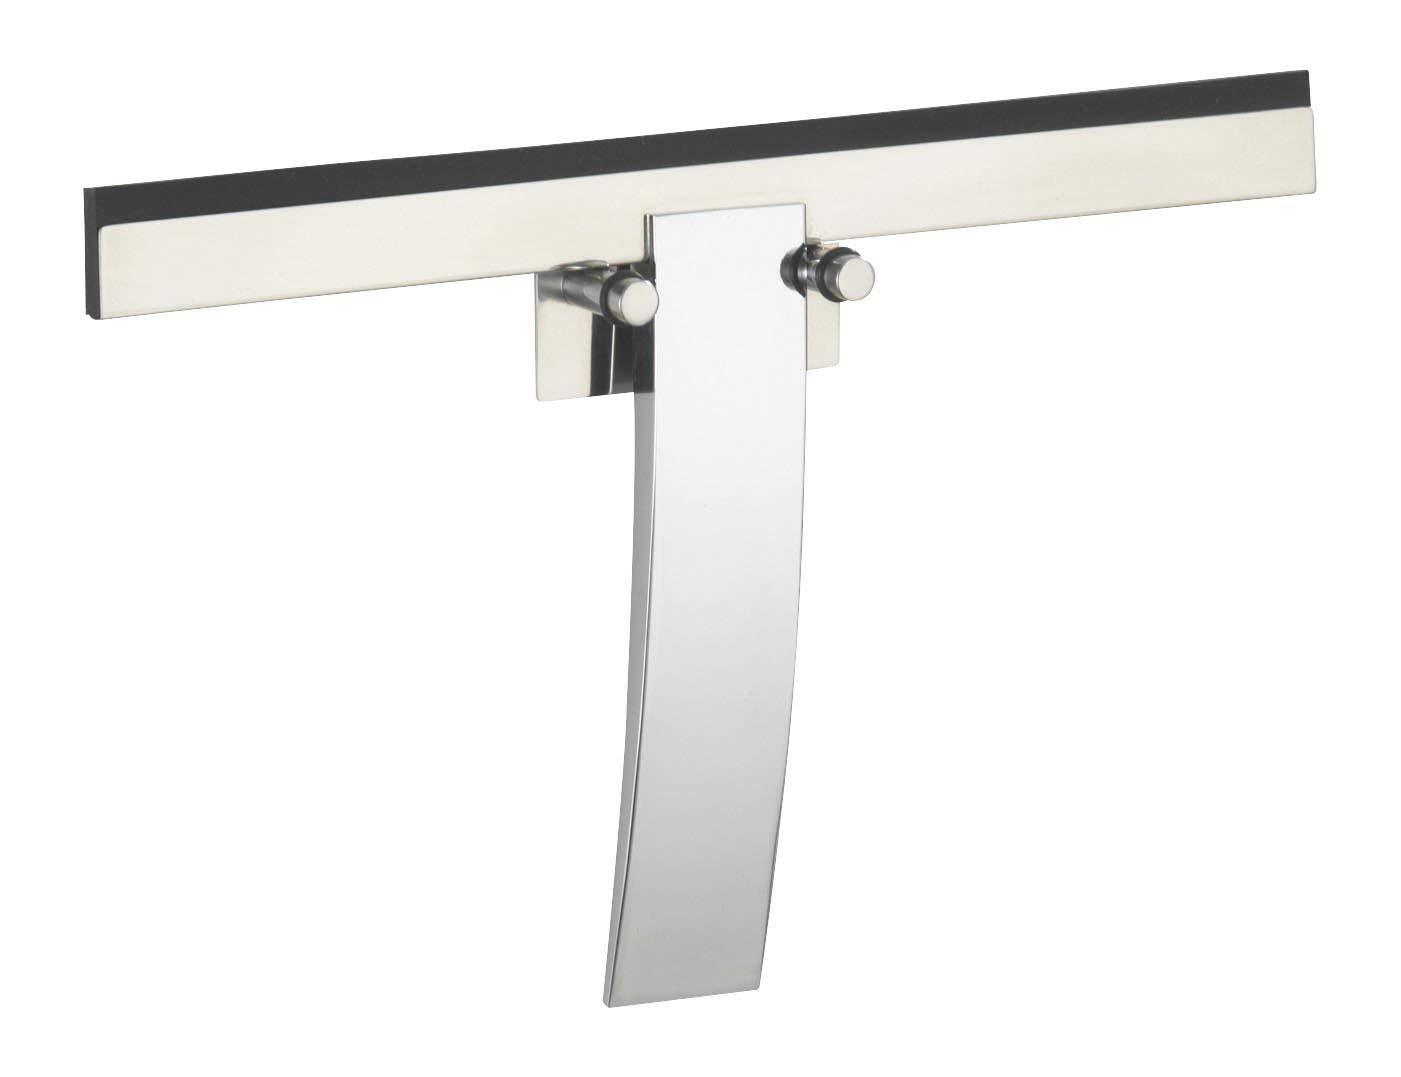 WENKO 18172100 Bathroom wiper Gela, shiny for bath and shower, Metal Zinc diecasting, Shiny by